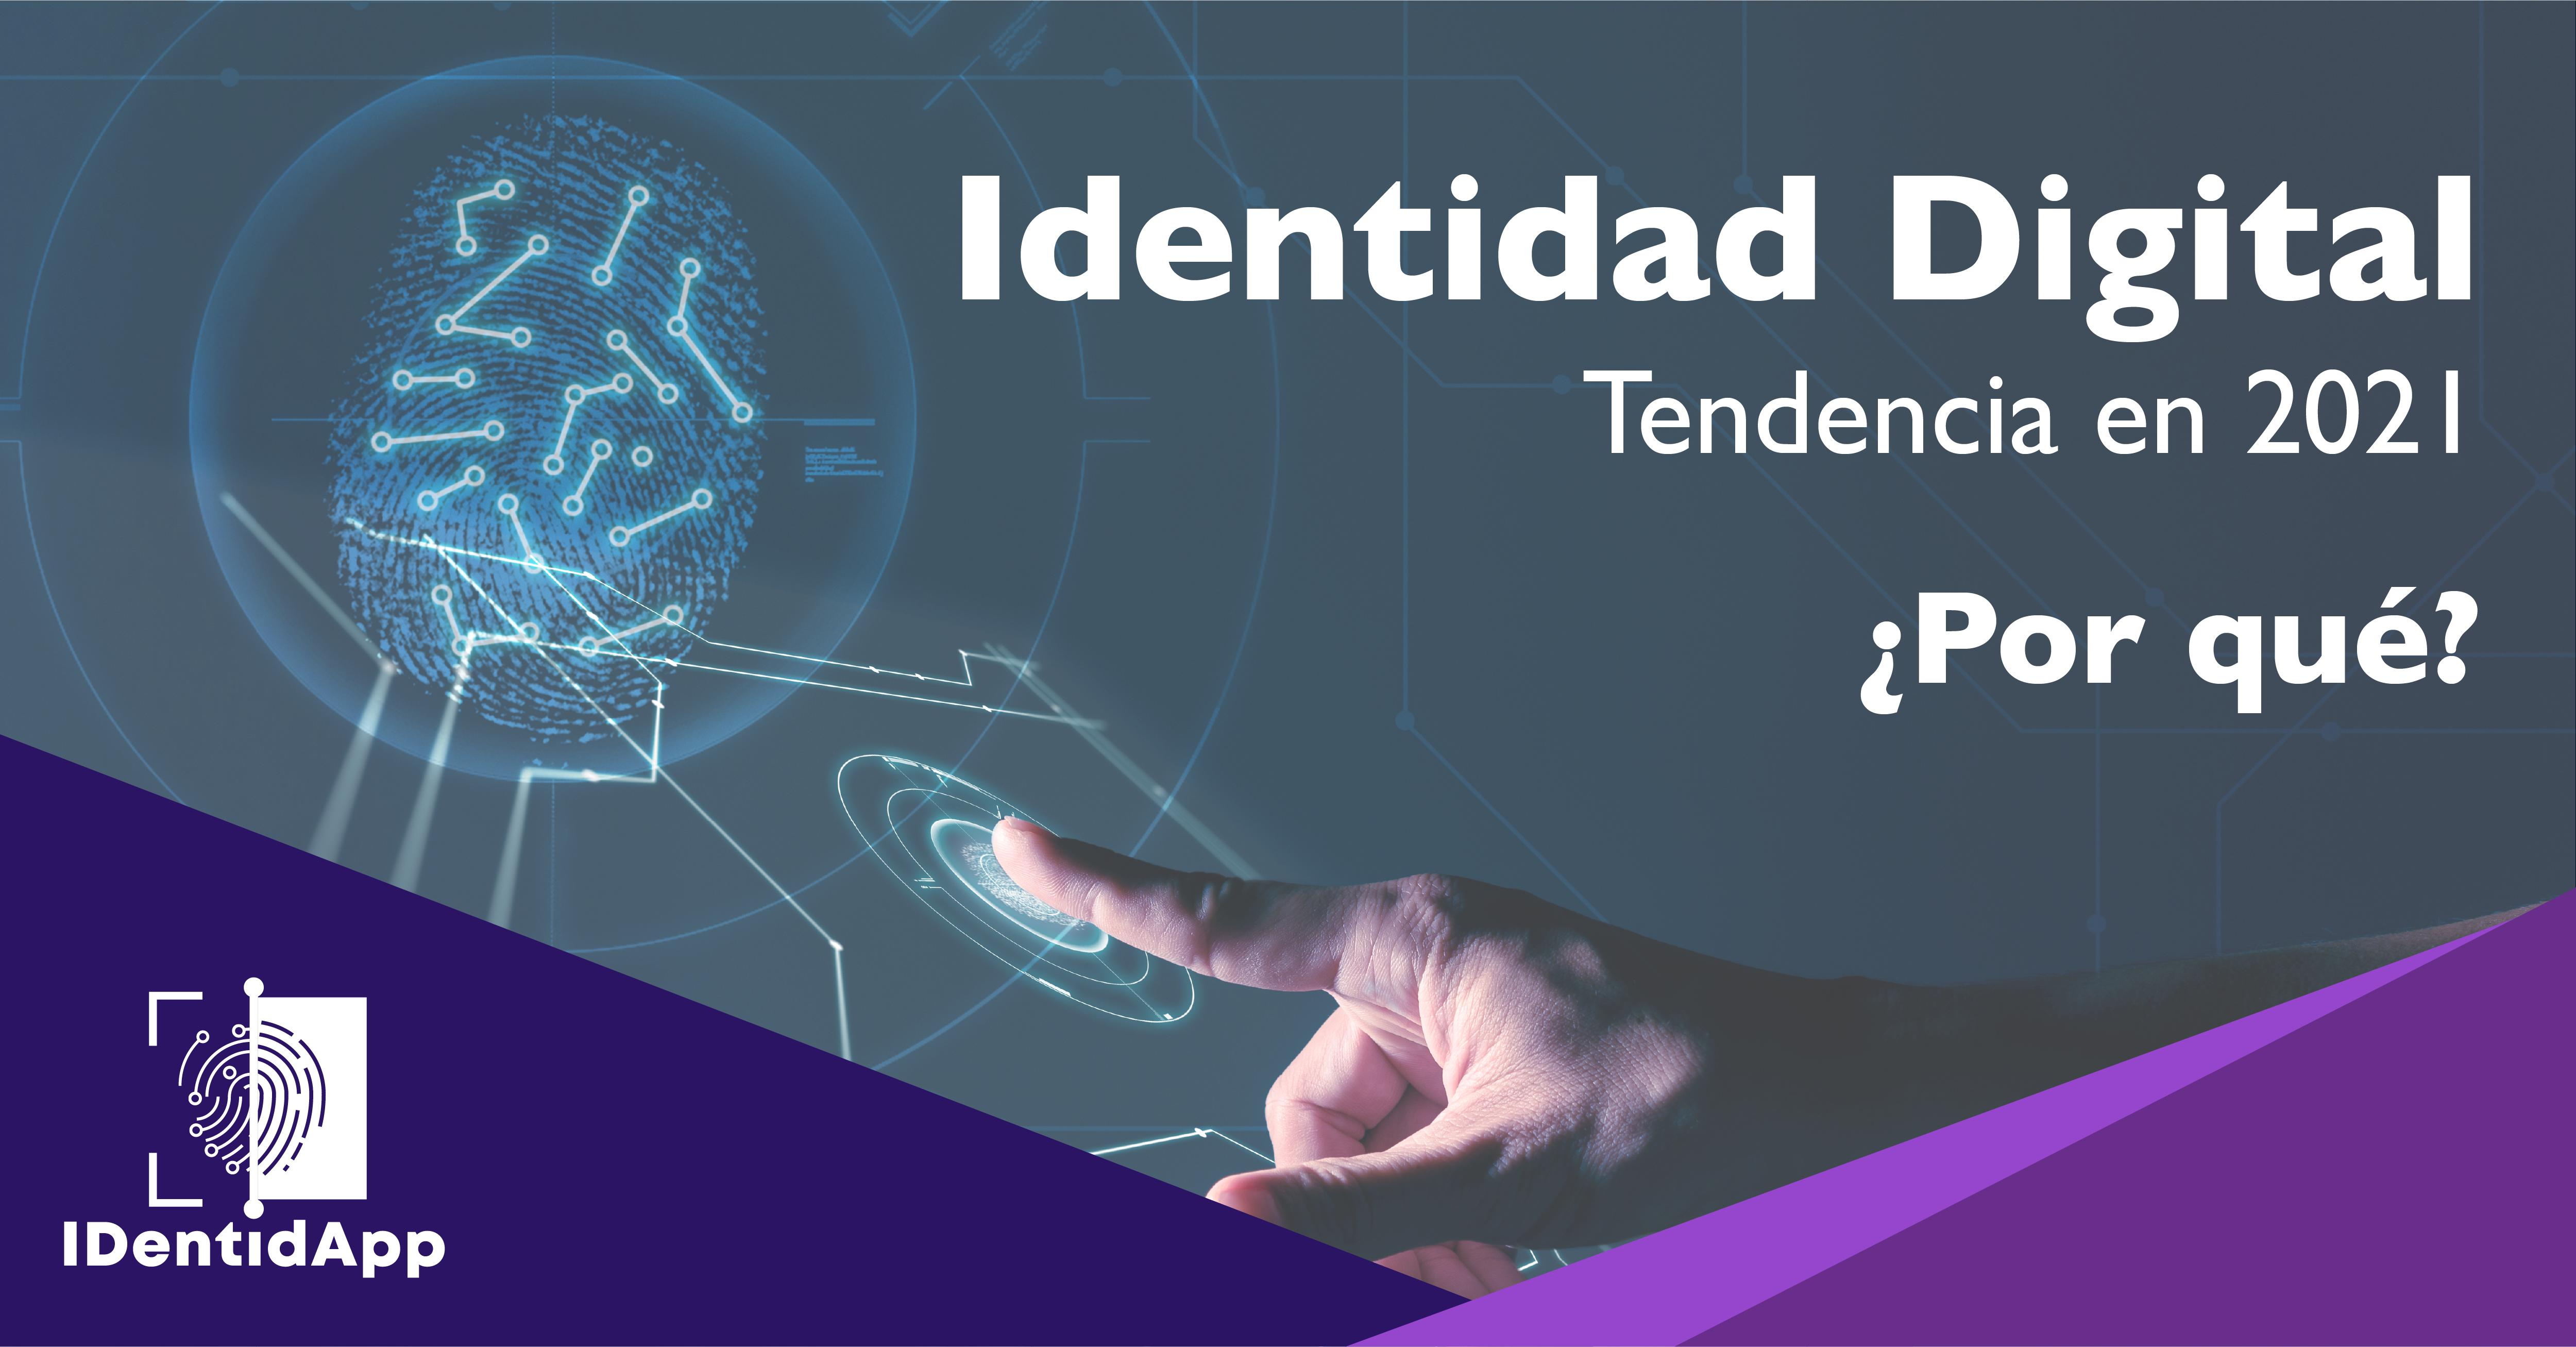 Identidad Digital: Tendencia 2021